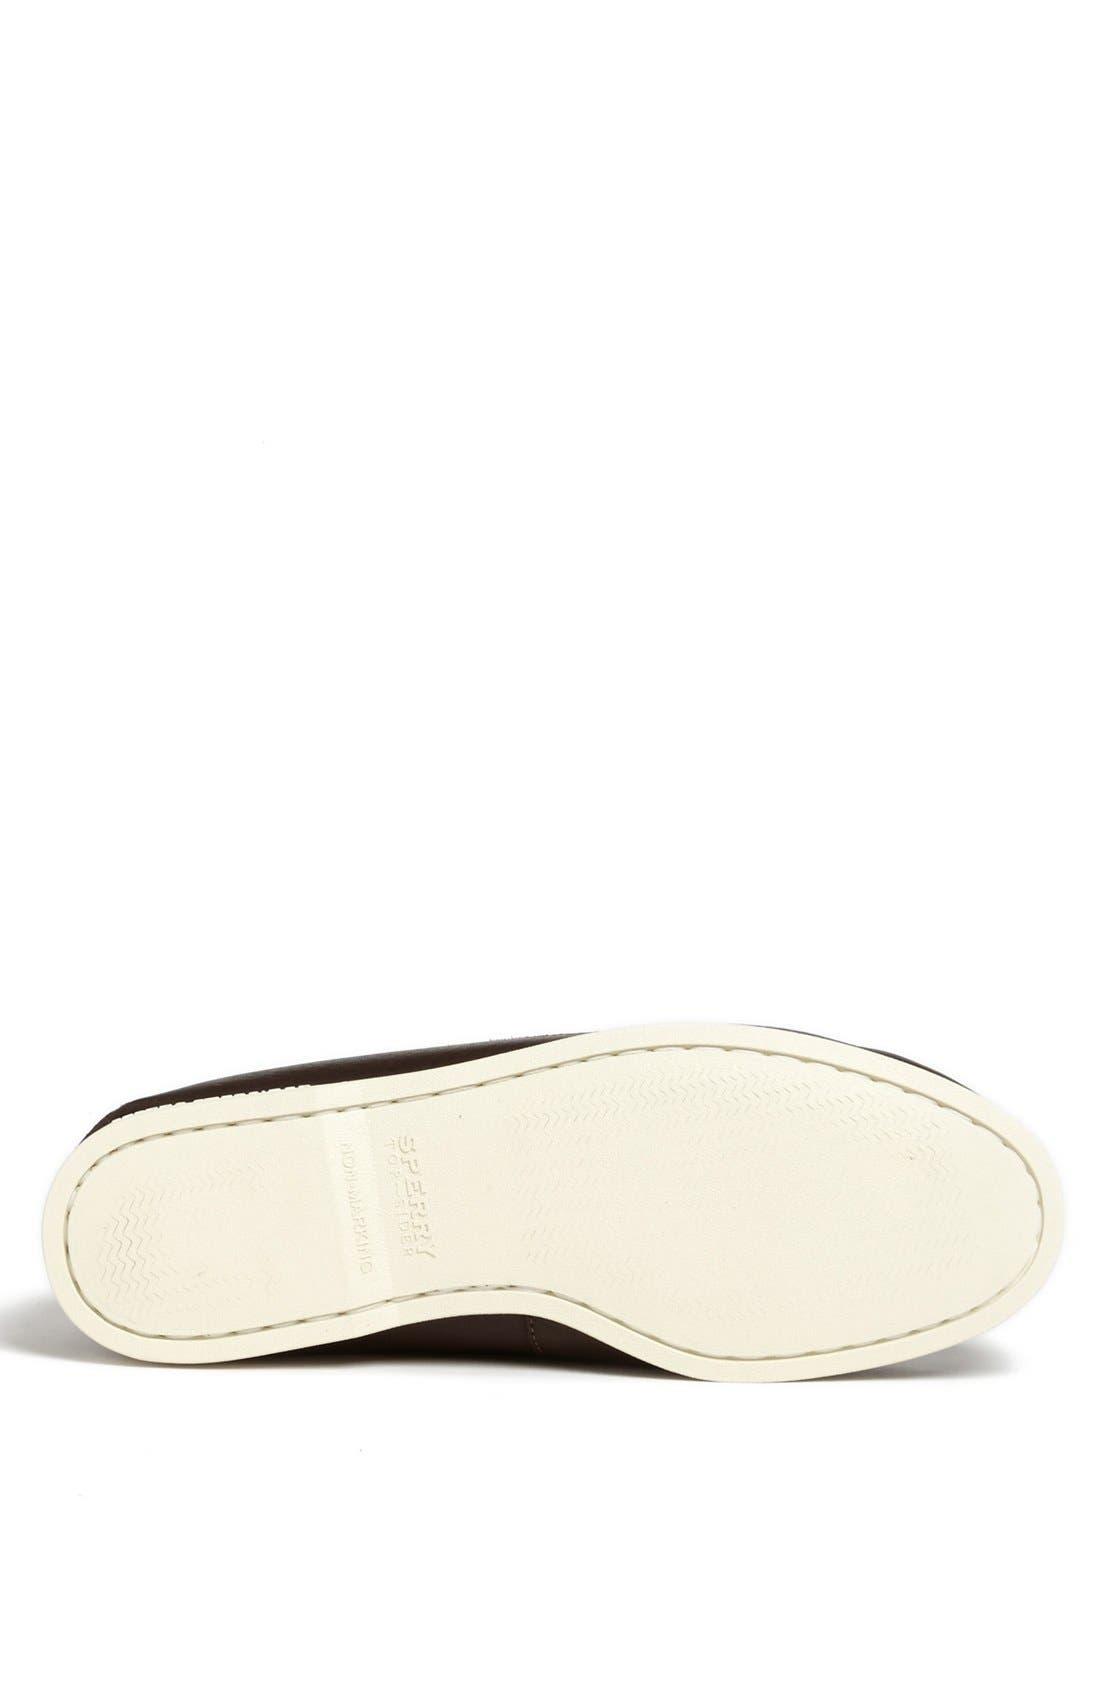 Top-Sider<sup>®</sup> 'Authentic Original - Winter' Boat Shoe,                             Alternate thumbnail 3, color,                             200